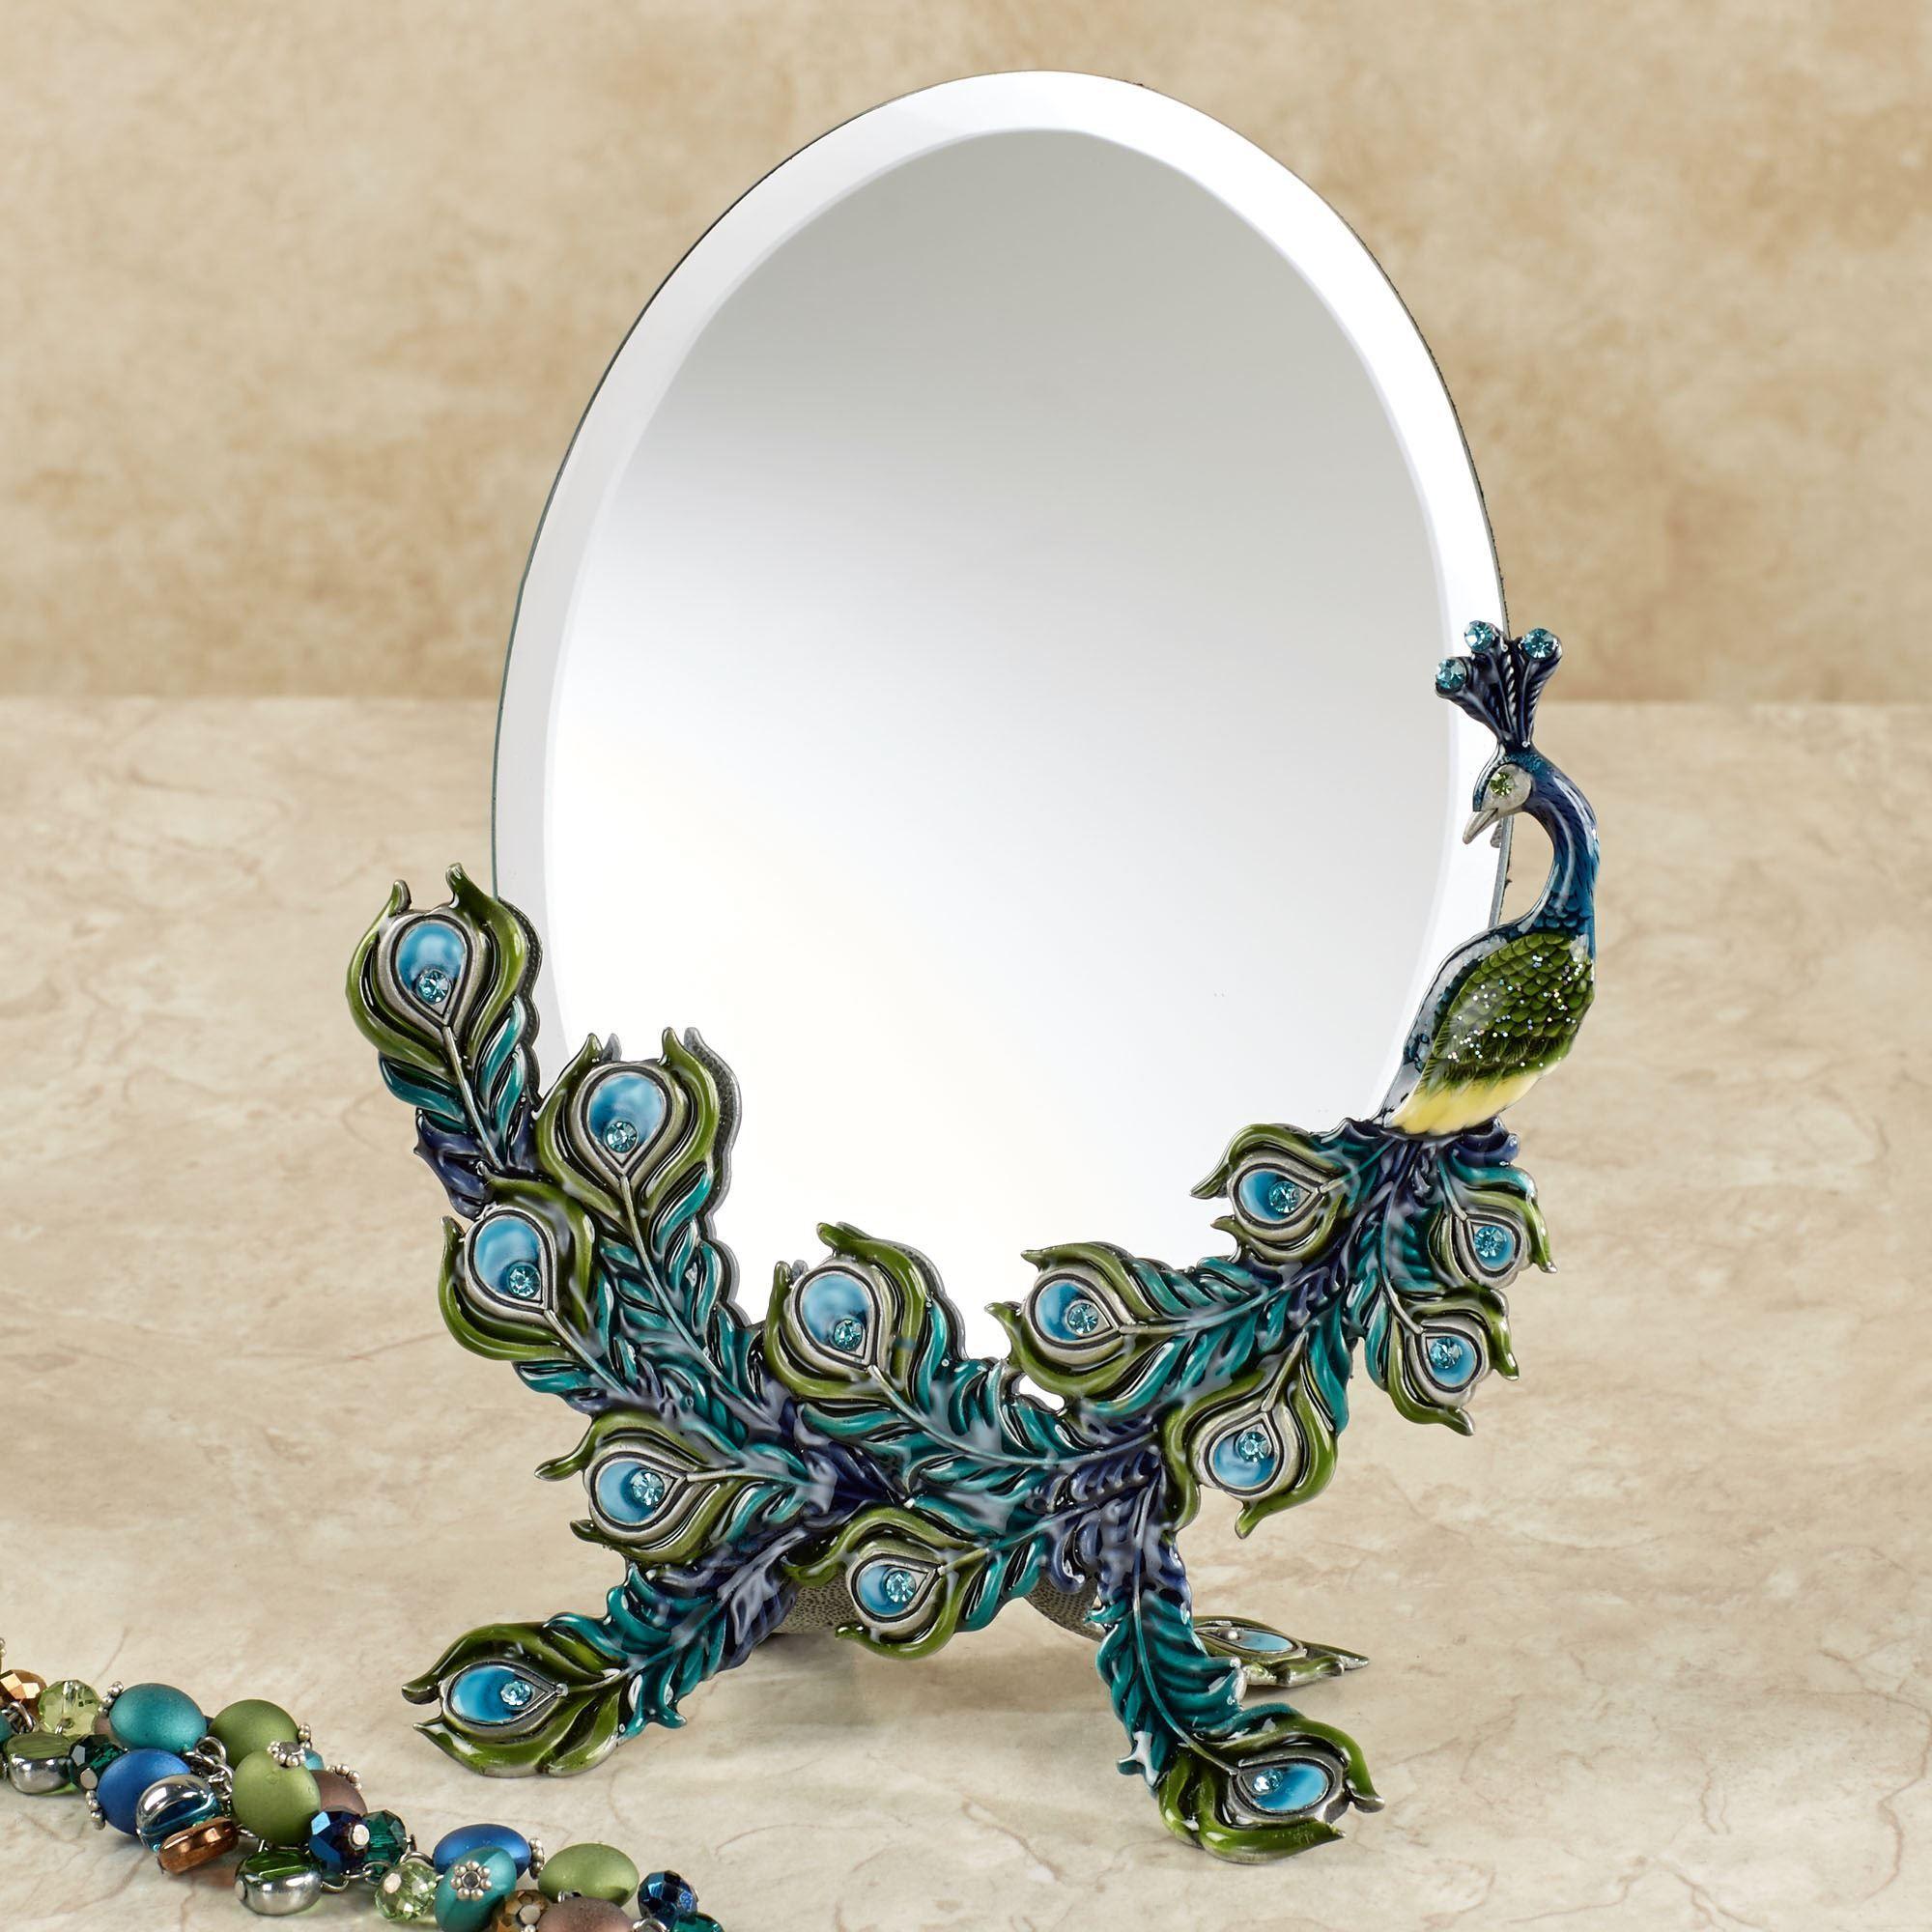 Tabletop Decorative Vanity Mirrors Ideas